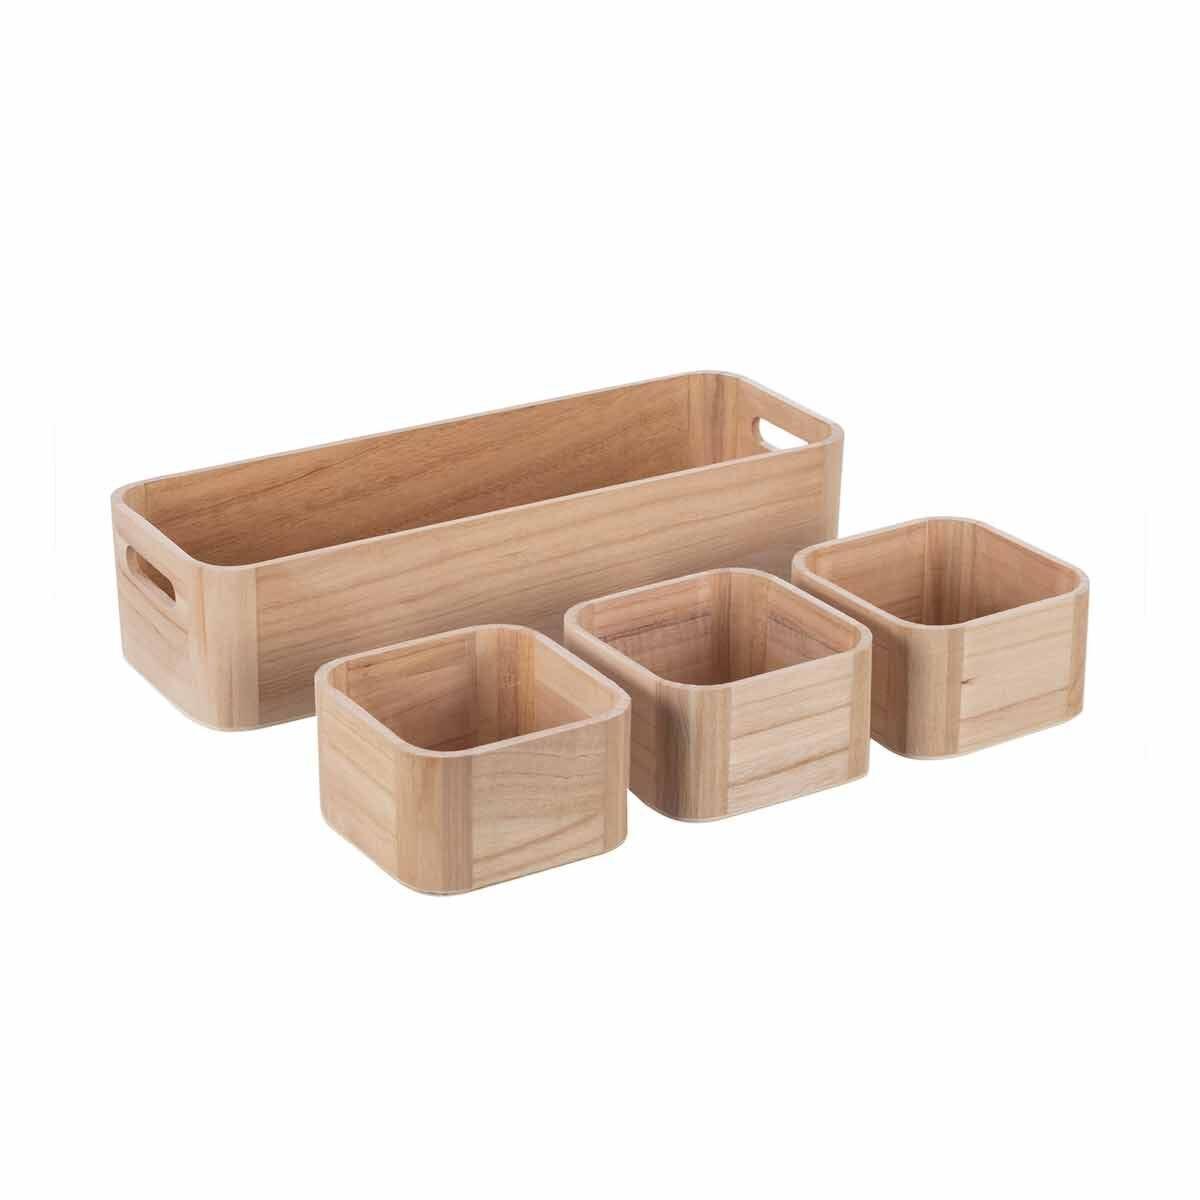 Ryman Wooden Storage Set of 4